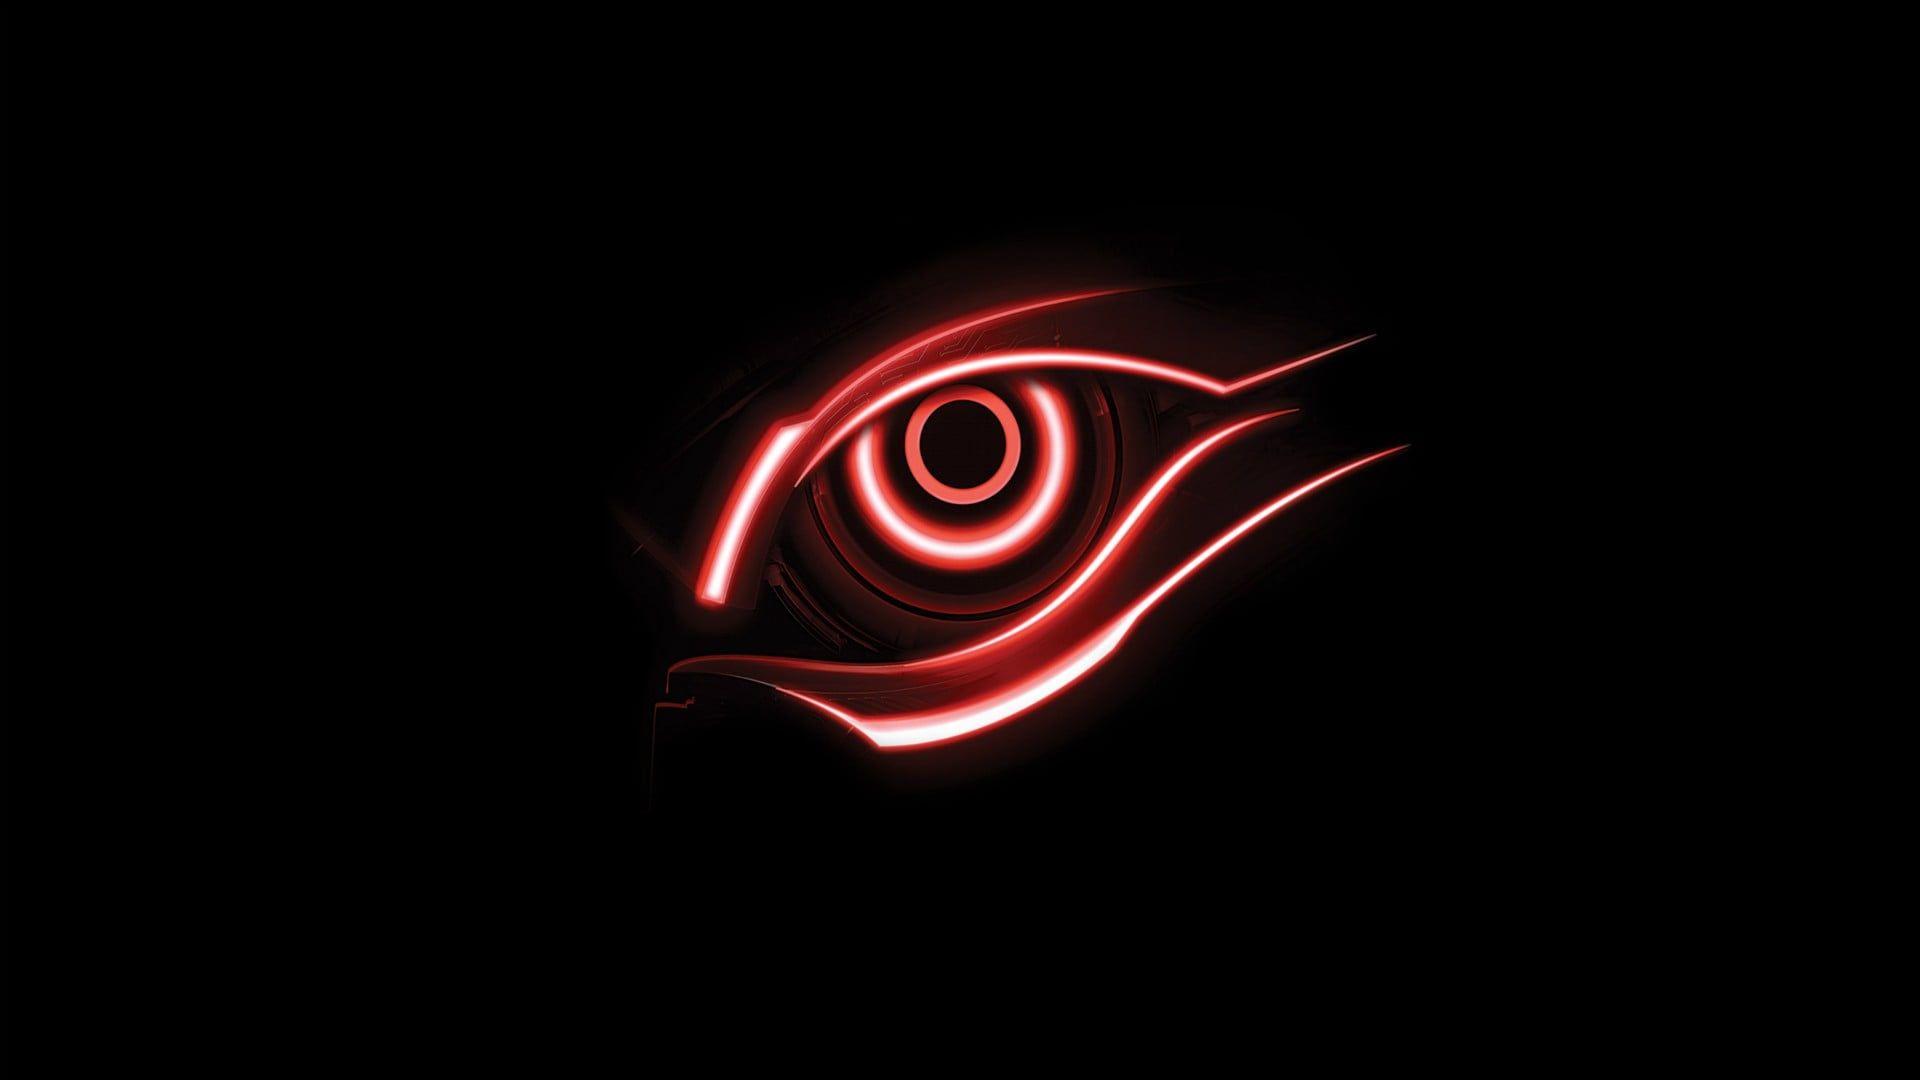 Red Halo Headlight Wallpaper Eye Illustration Eyes Black Background Eyes Wallpaper Eye Illustration Red And Black Wallpaper